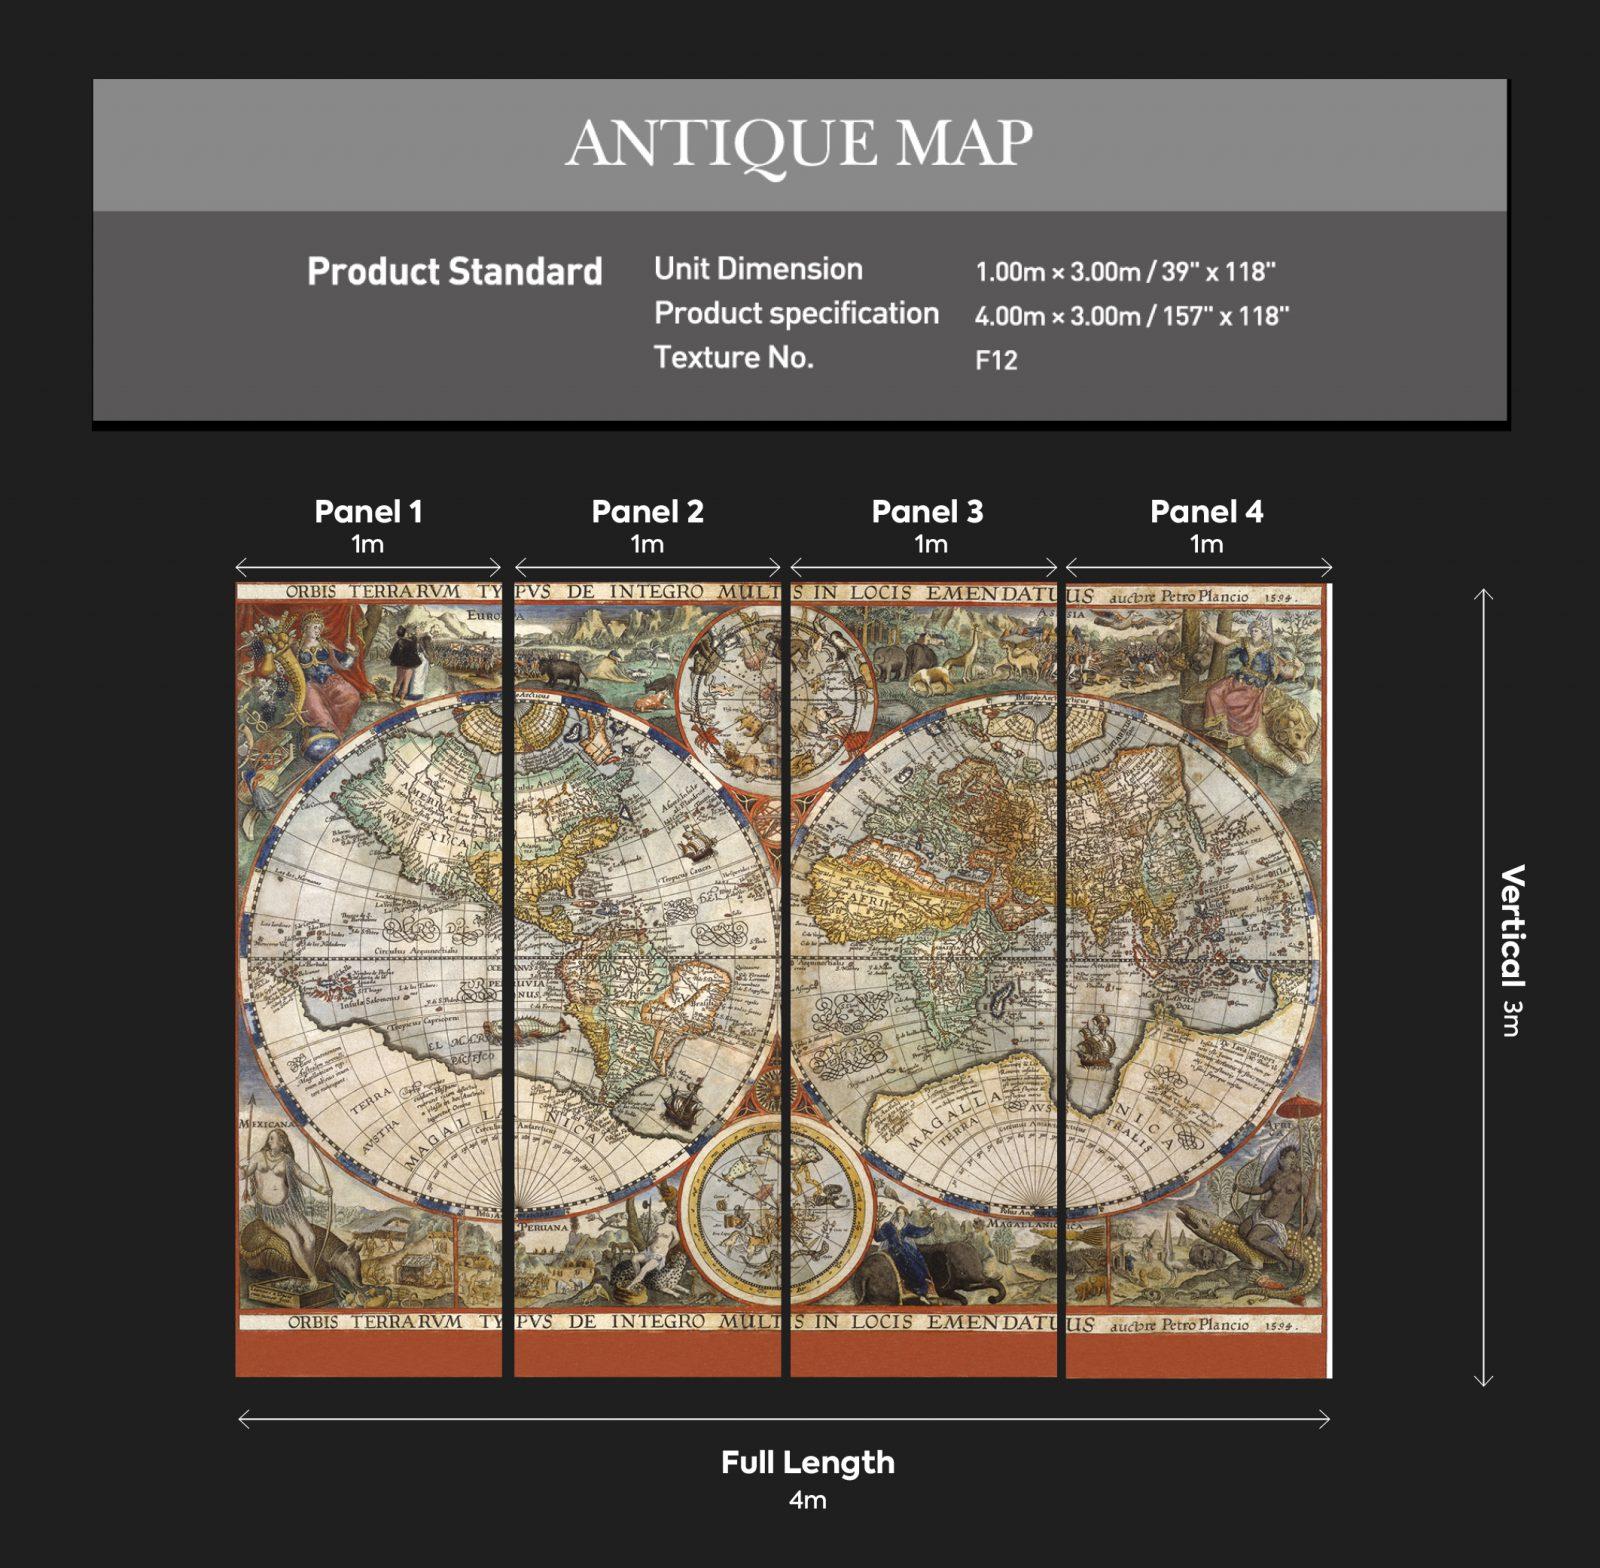 Antique Map Dimensions